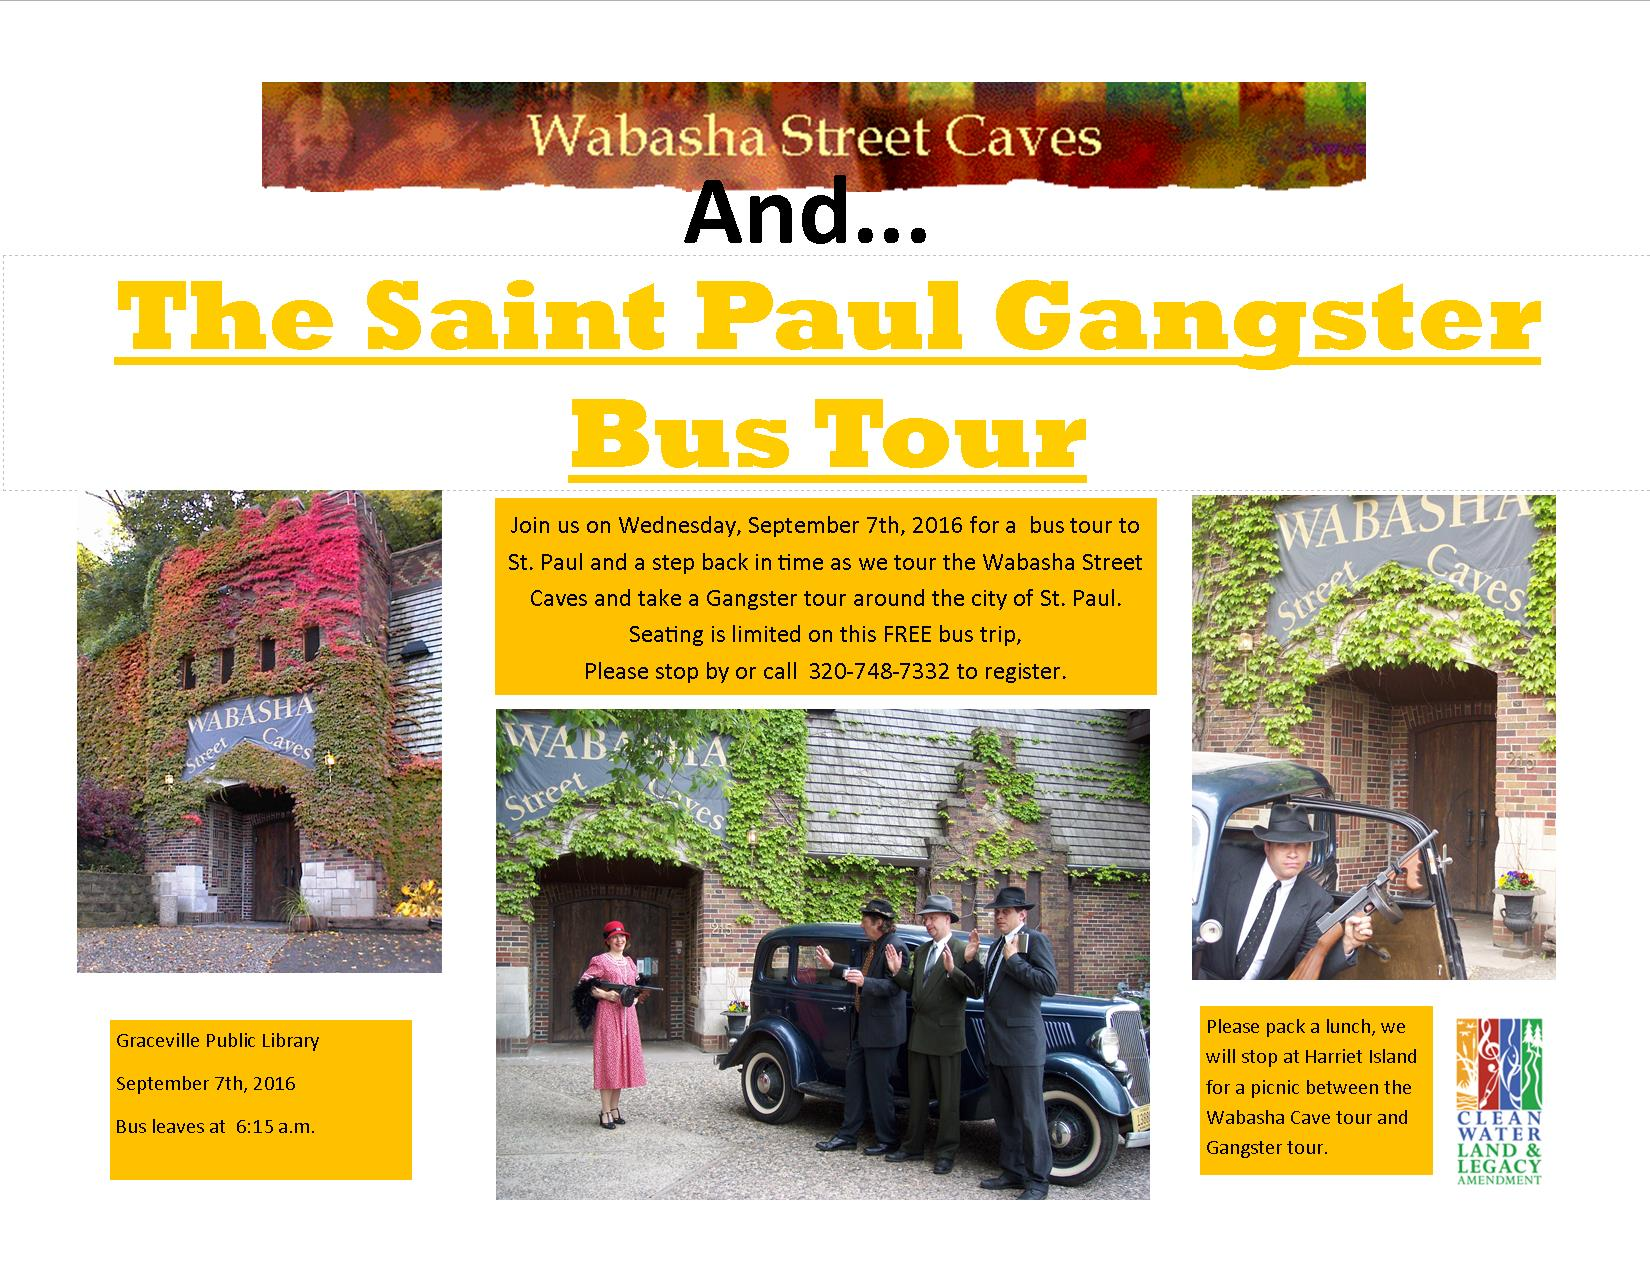 Wabasha caves and gangster tour bus trip Publication1-1